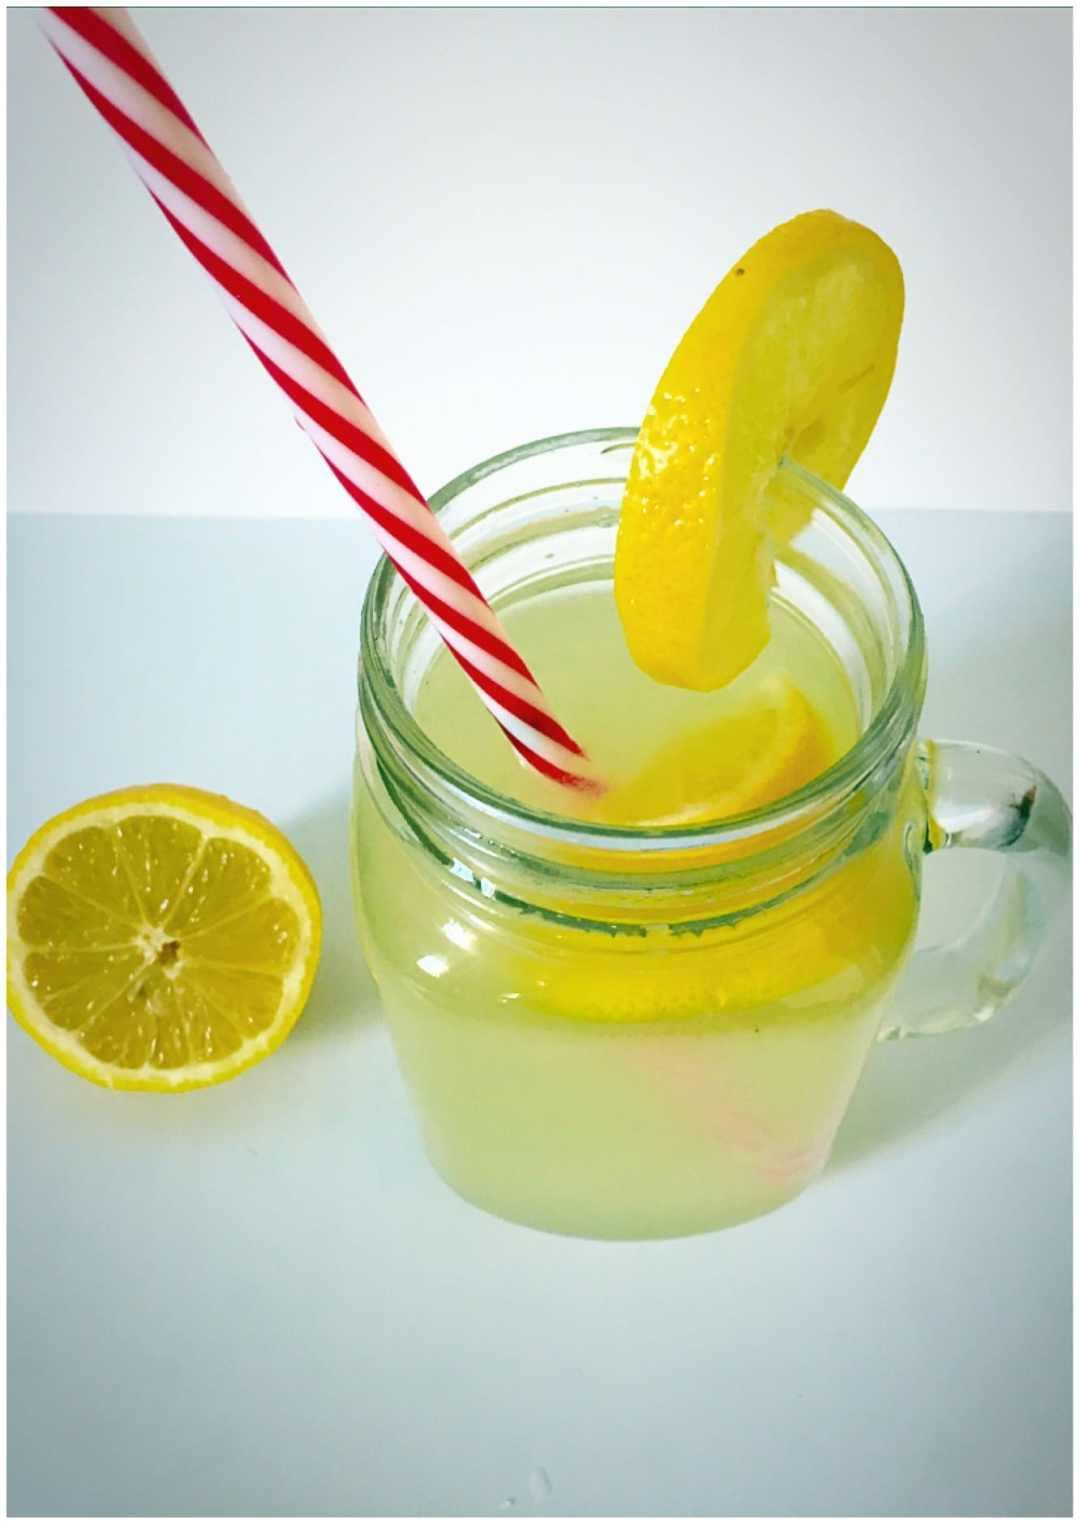 Honey-sweetened lemonade